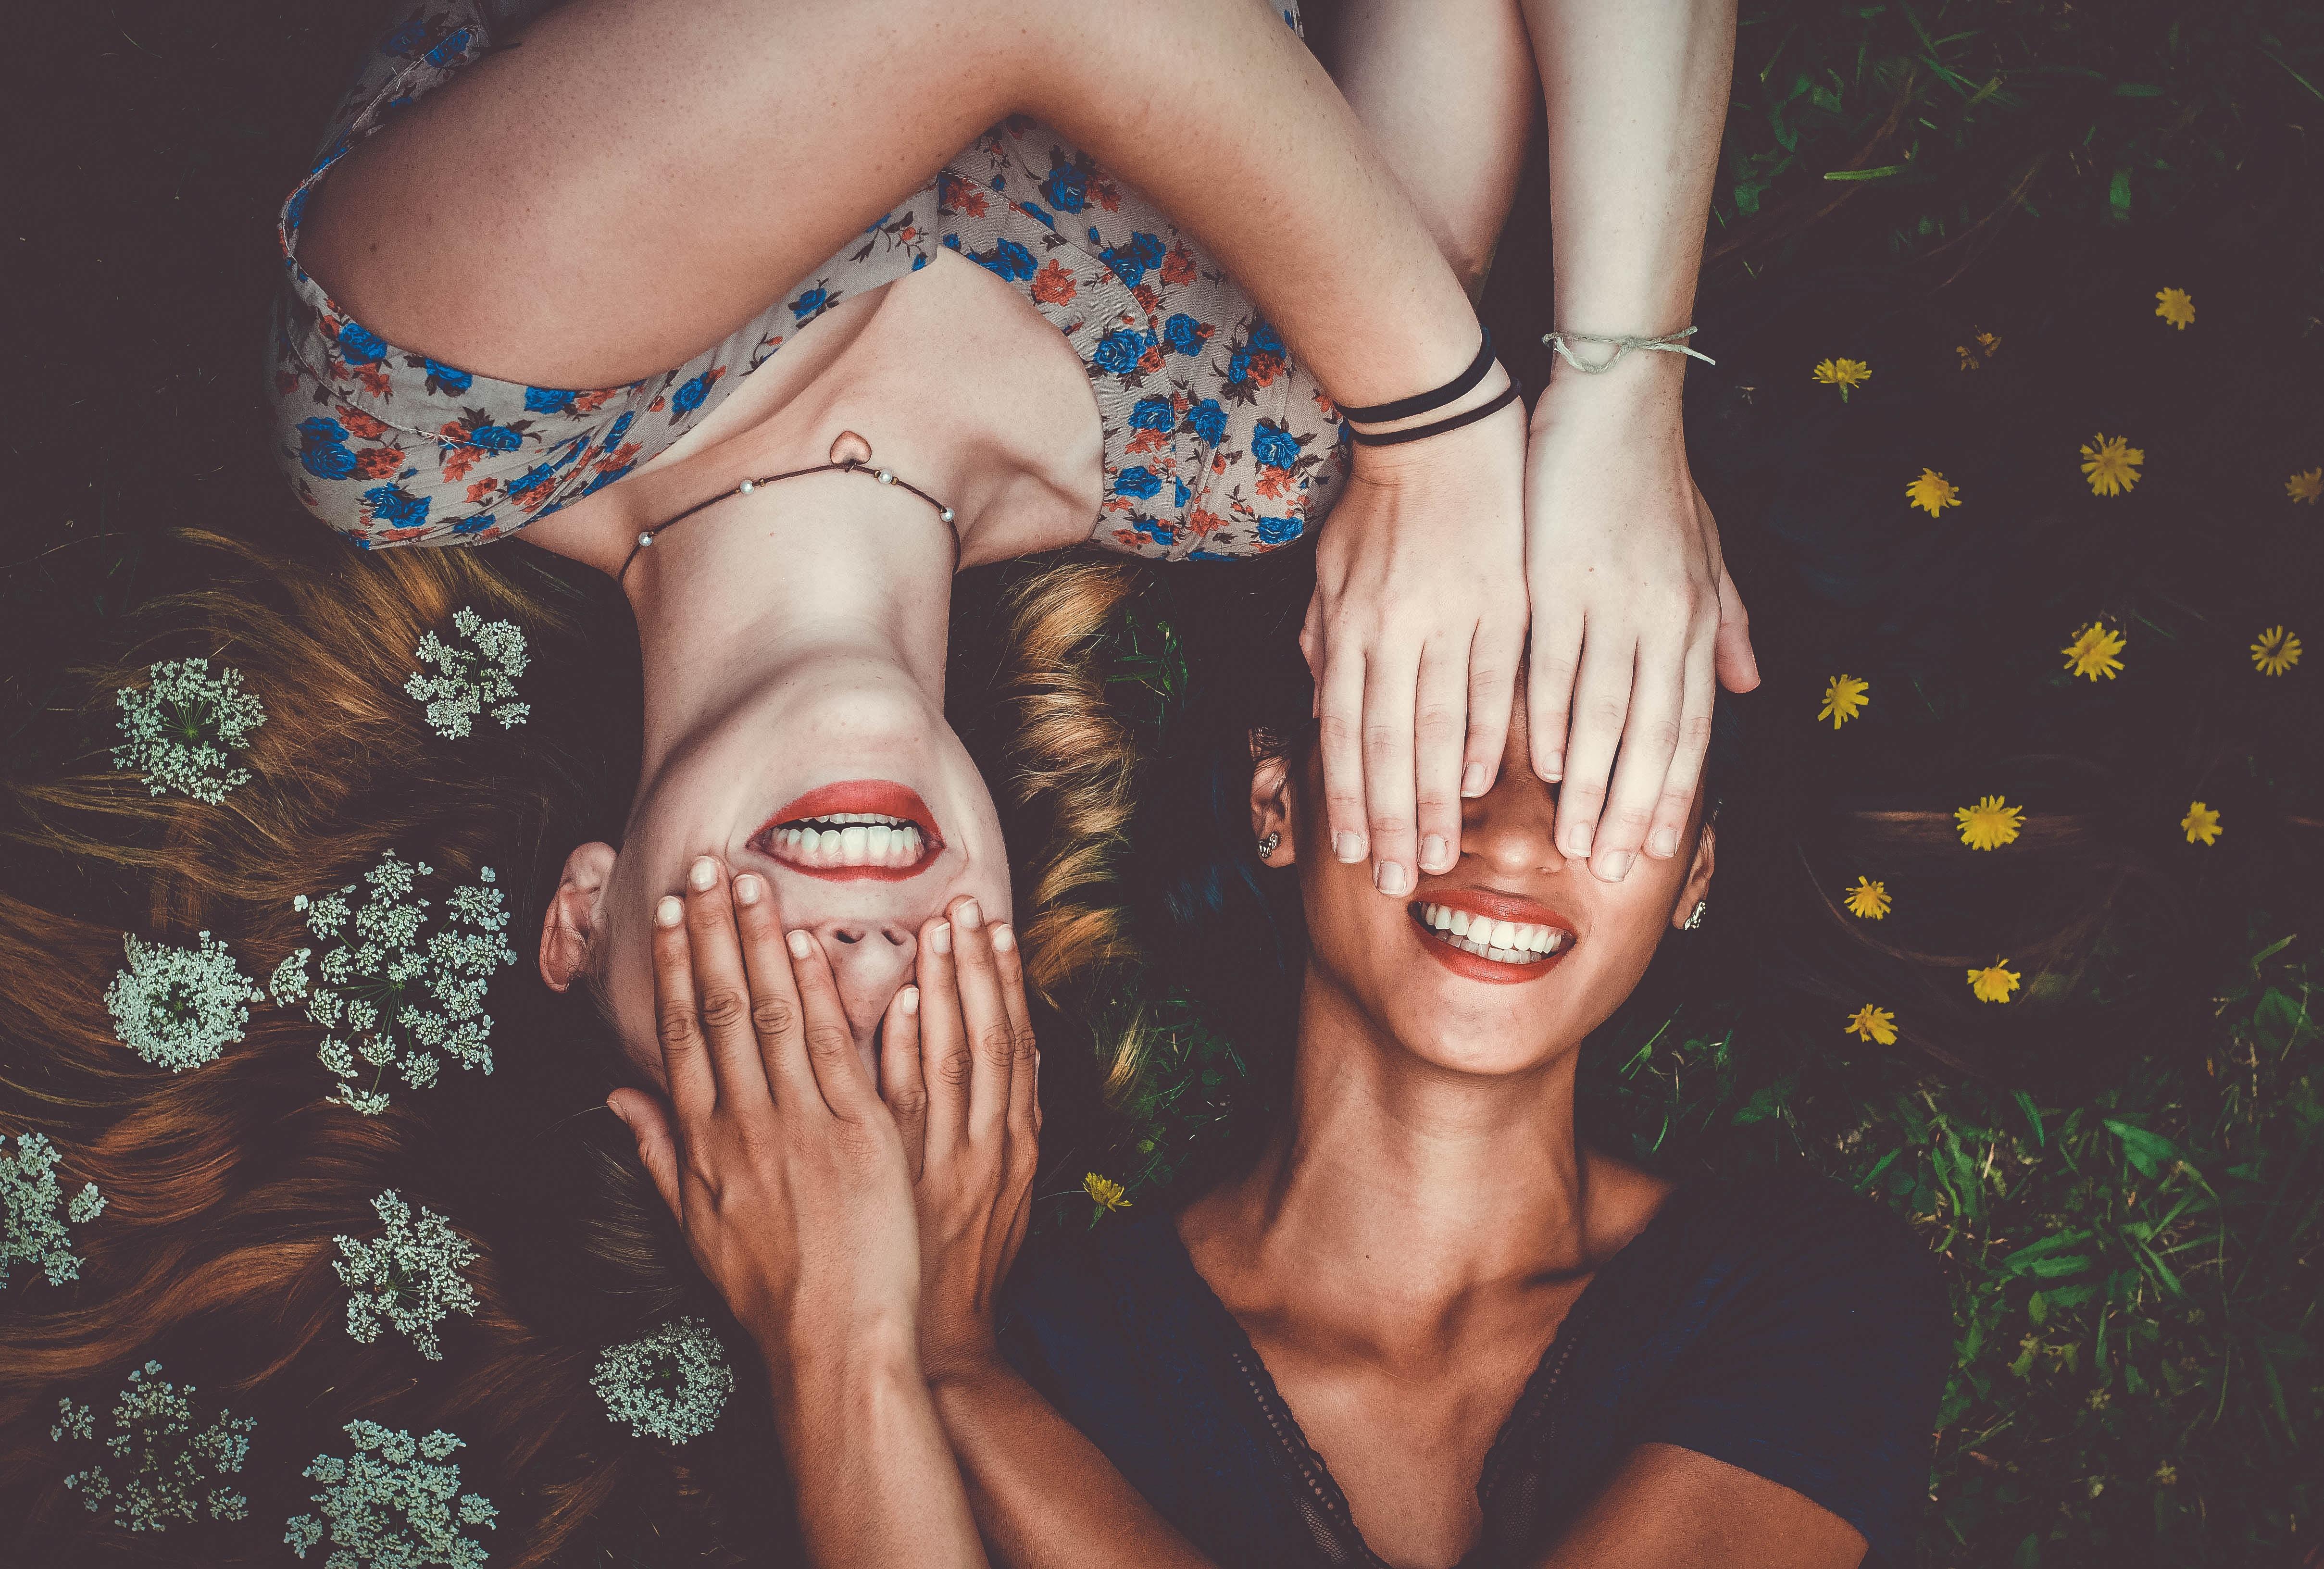 Smile by Sunny Dental